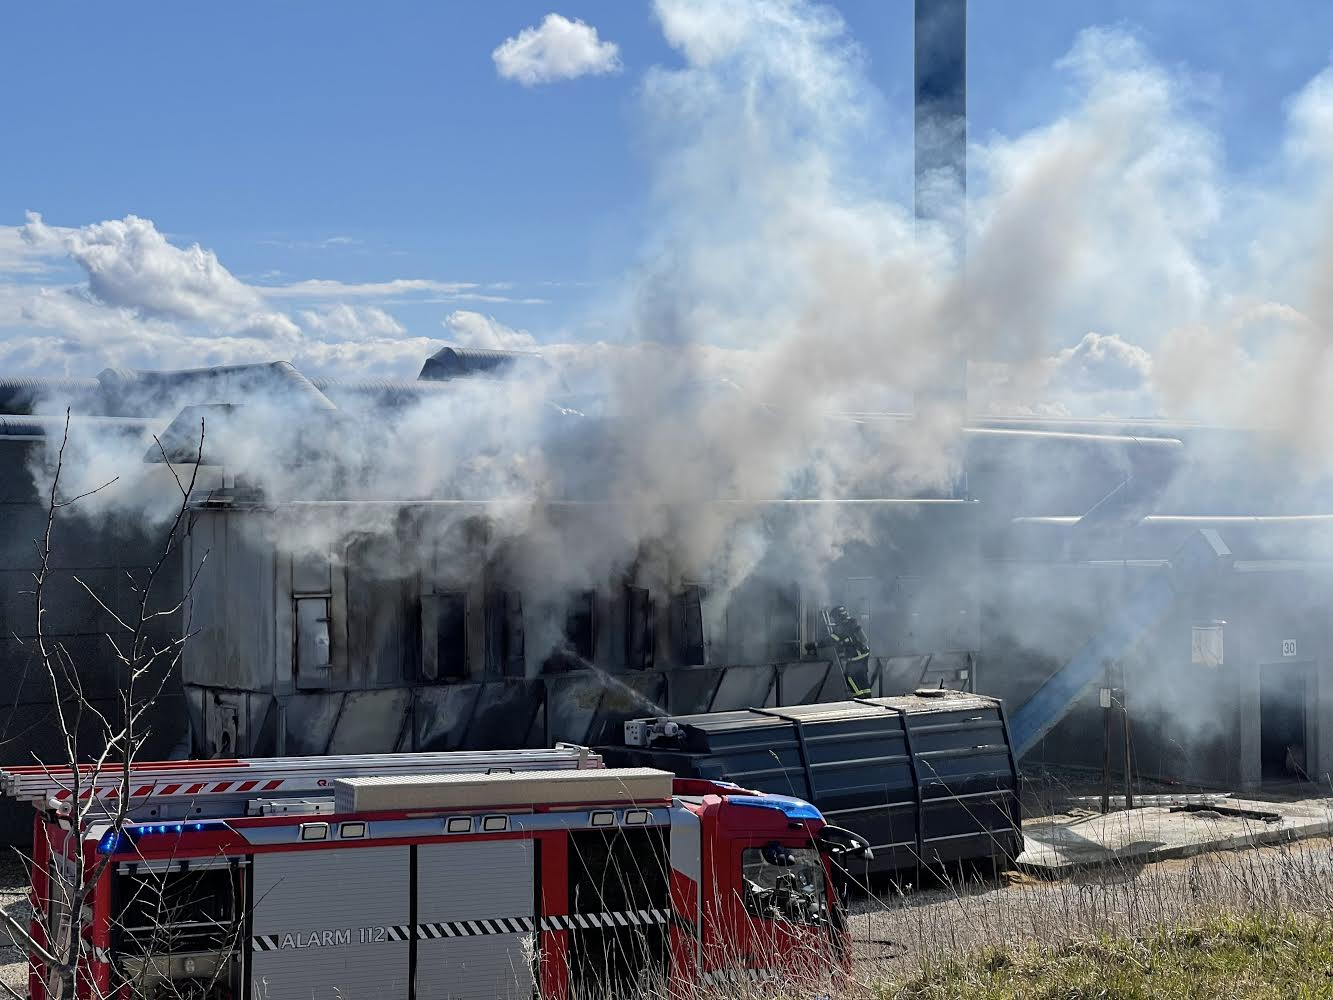 Brand i industribygning i Thisted